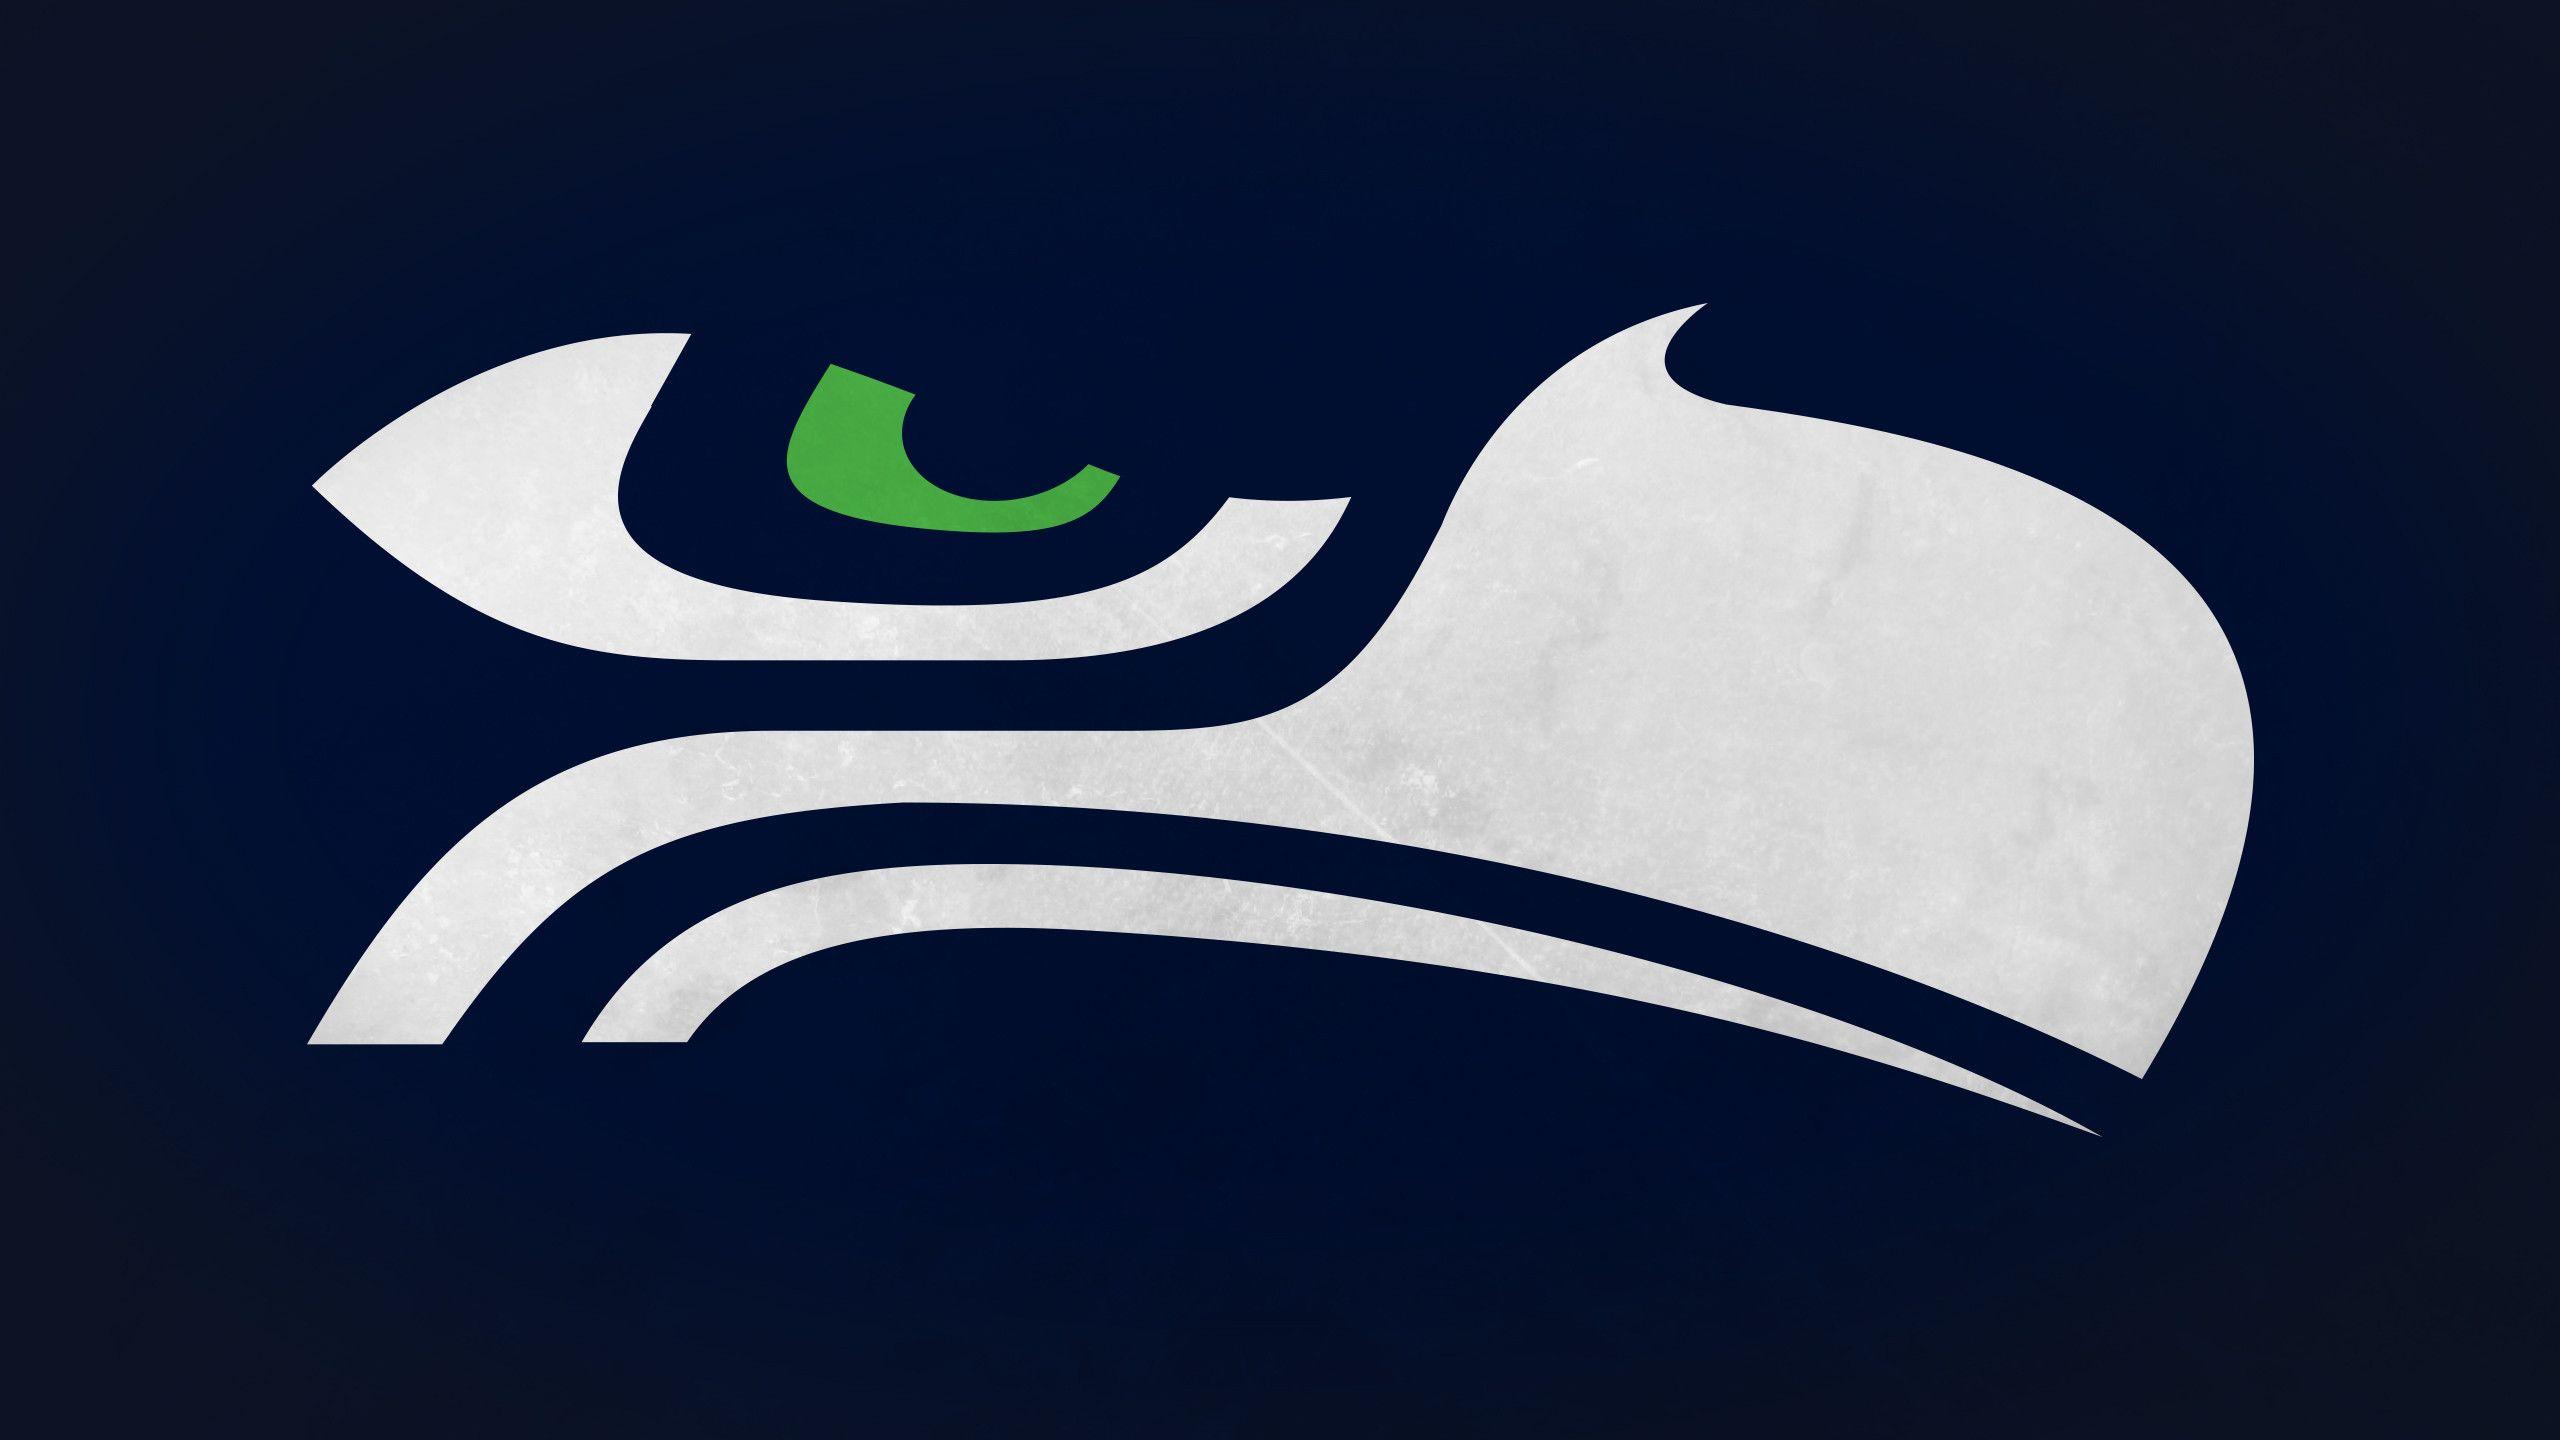 Image for Seattle Seahawks Logo Vector Seattle Seahawks